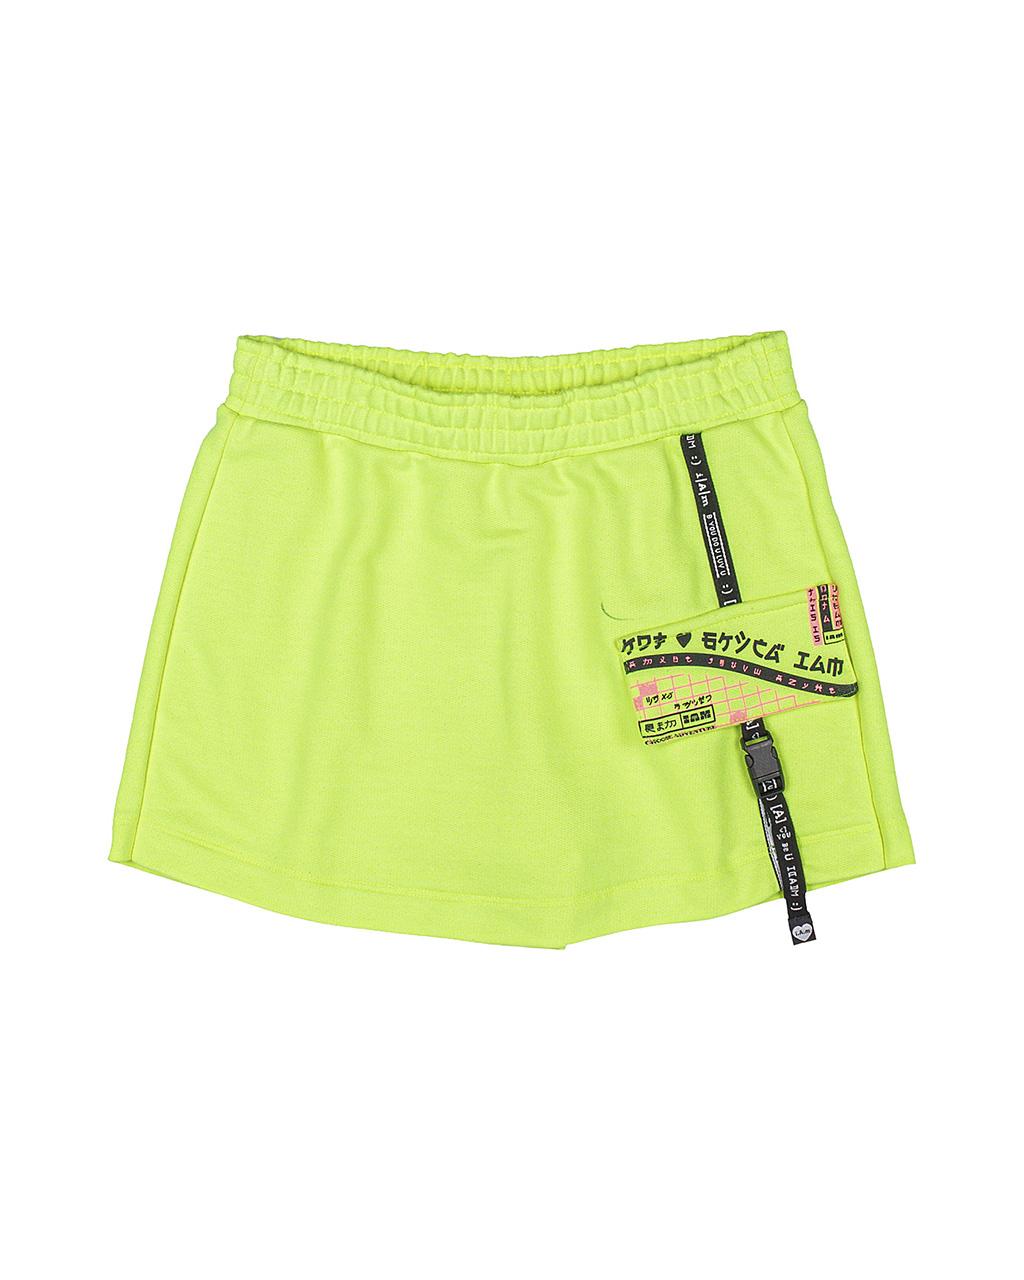 Shorts Saia Teen Detalhe Trava Mochila Verde Neon I Am